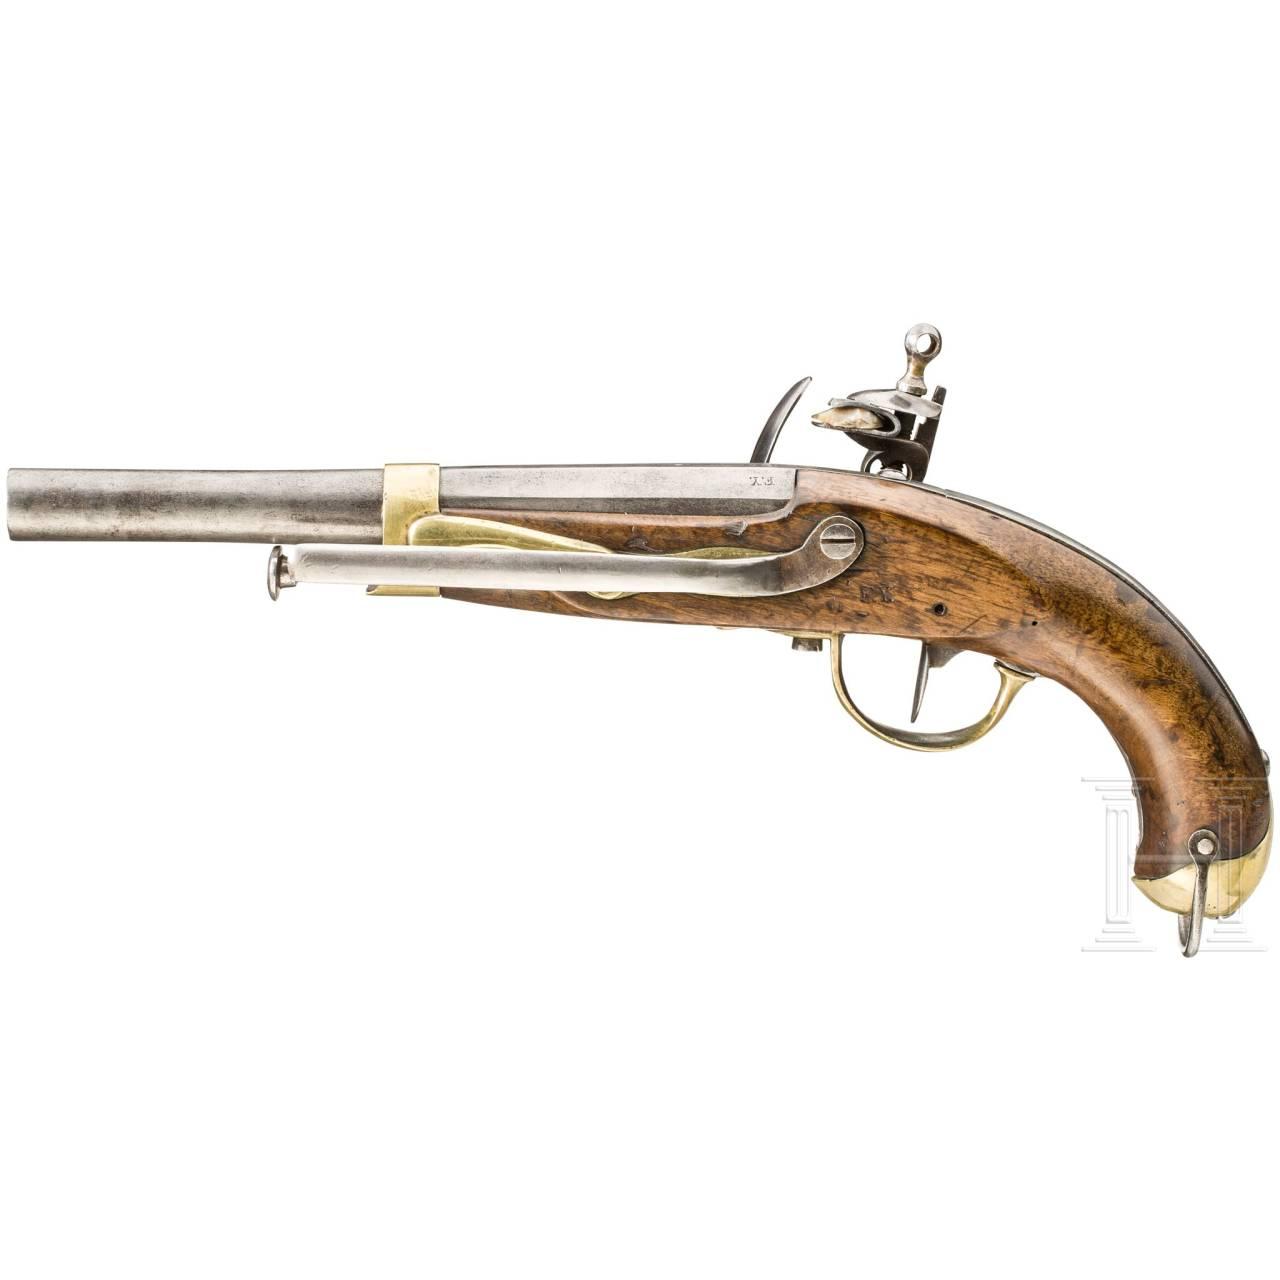 A cavalry pistol, Eibar (Spain), dated 1831